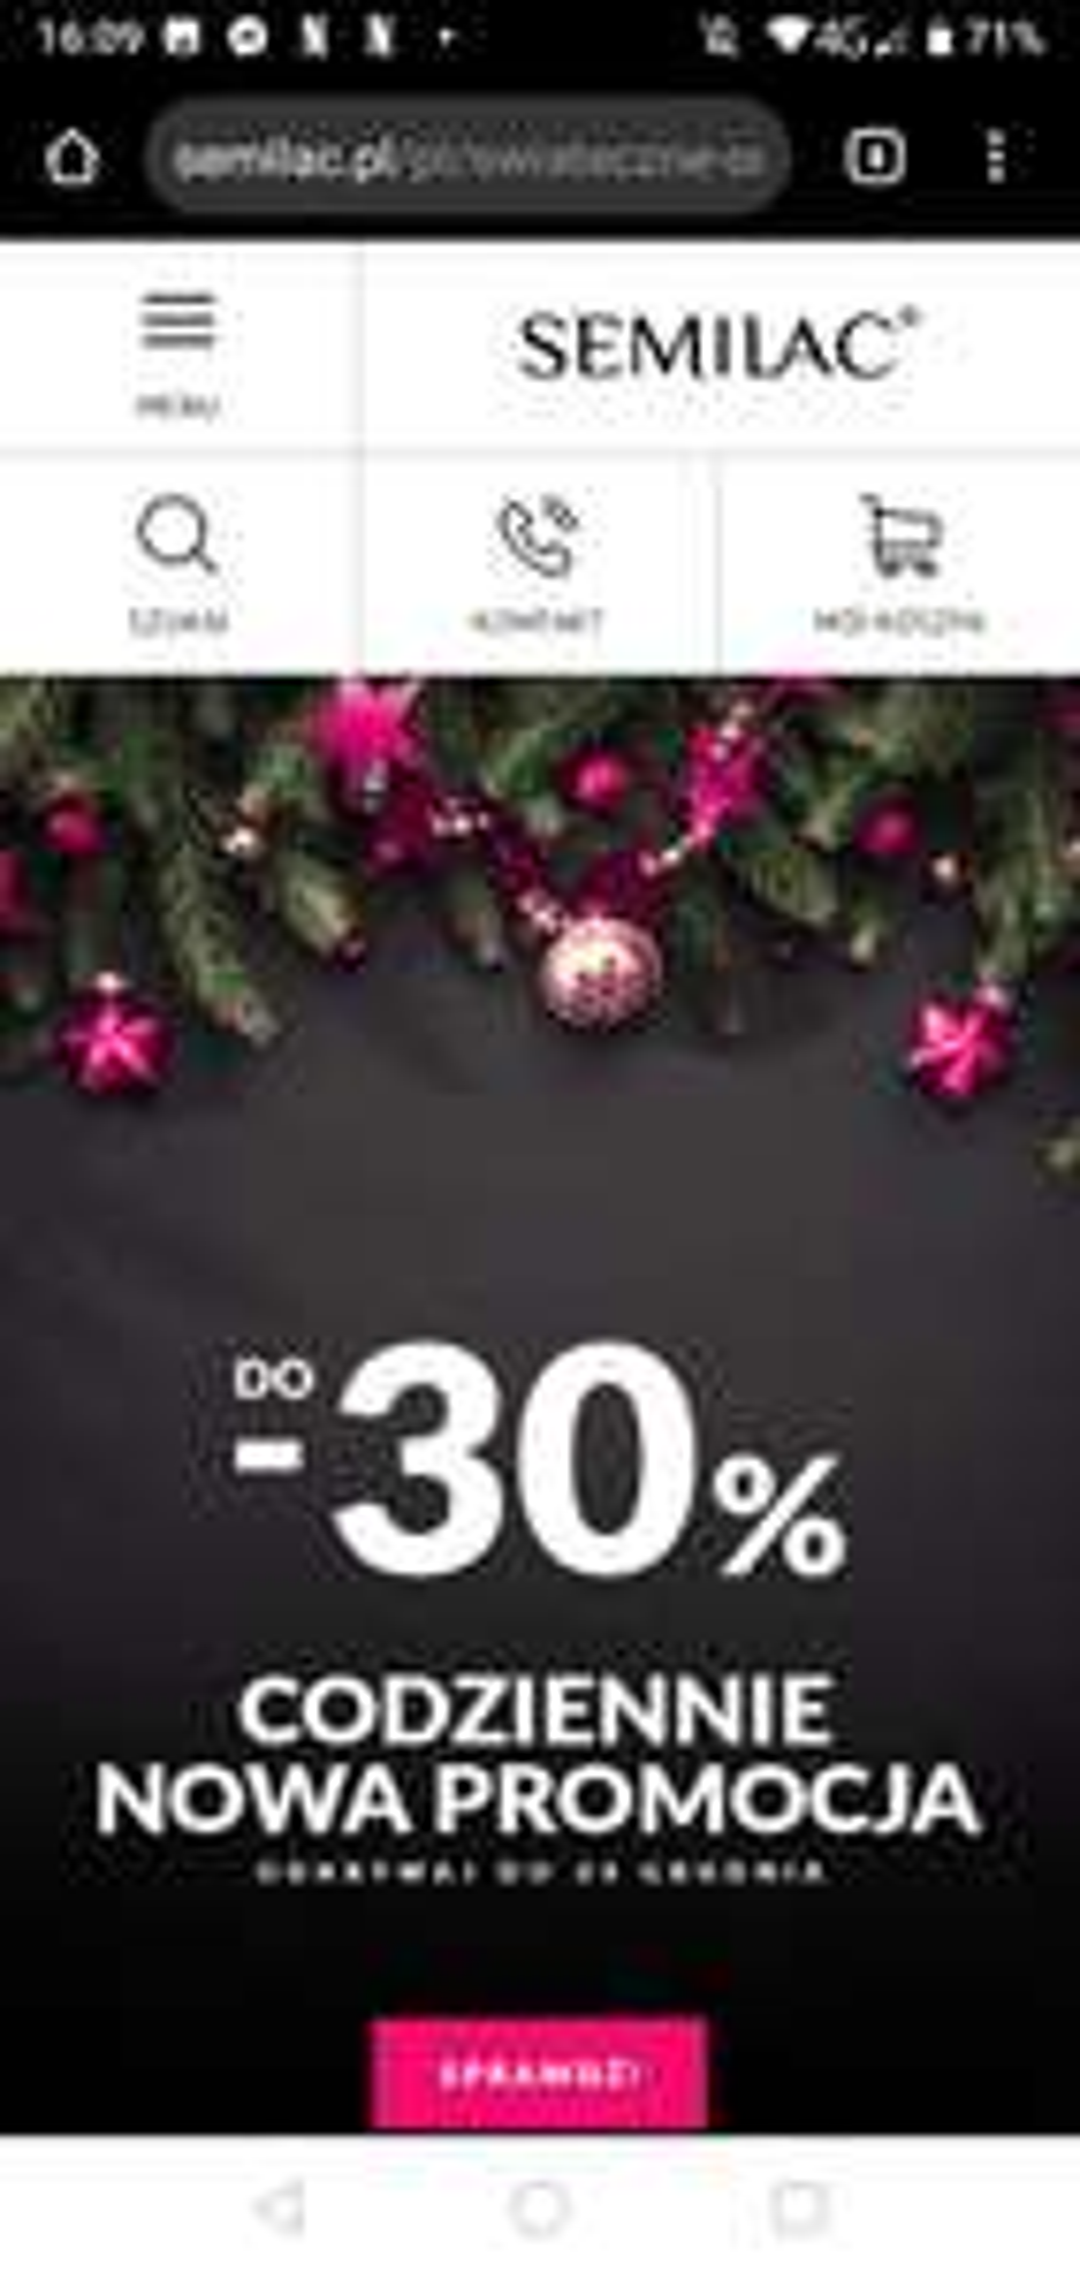 Do -30% na produkty Semilac